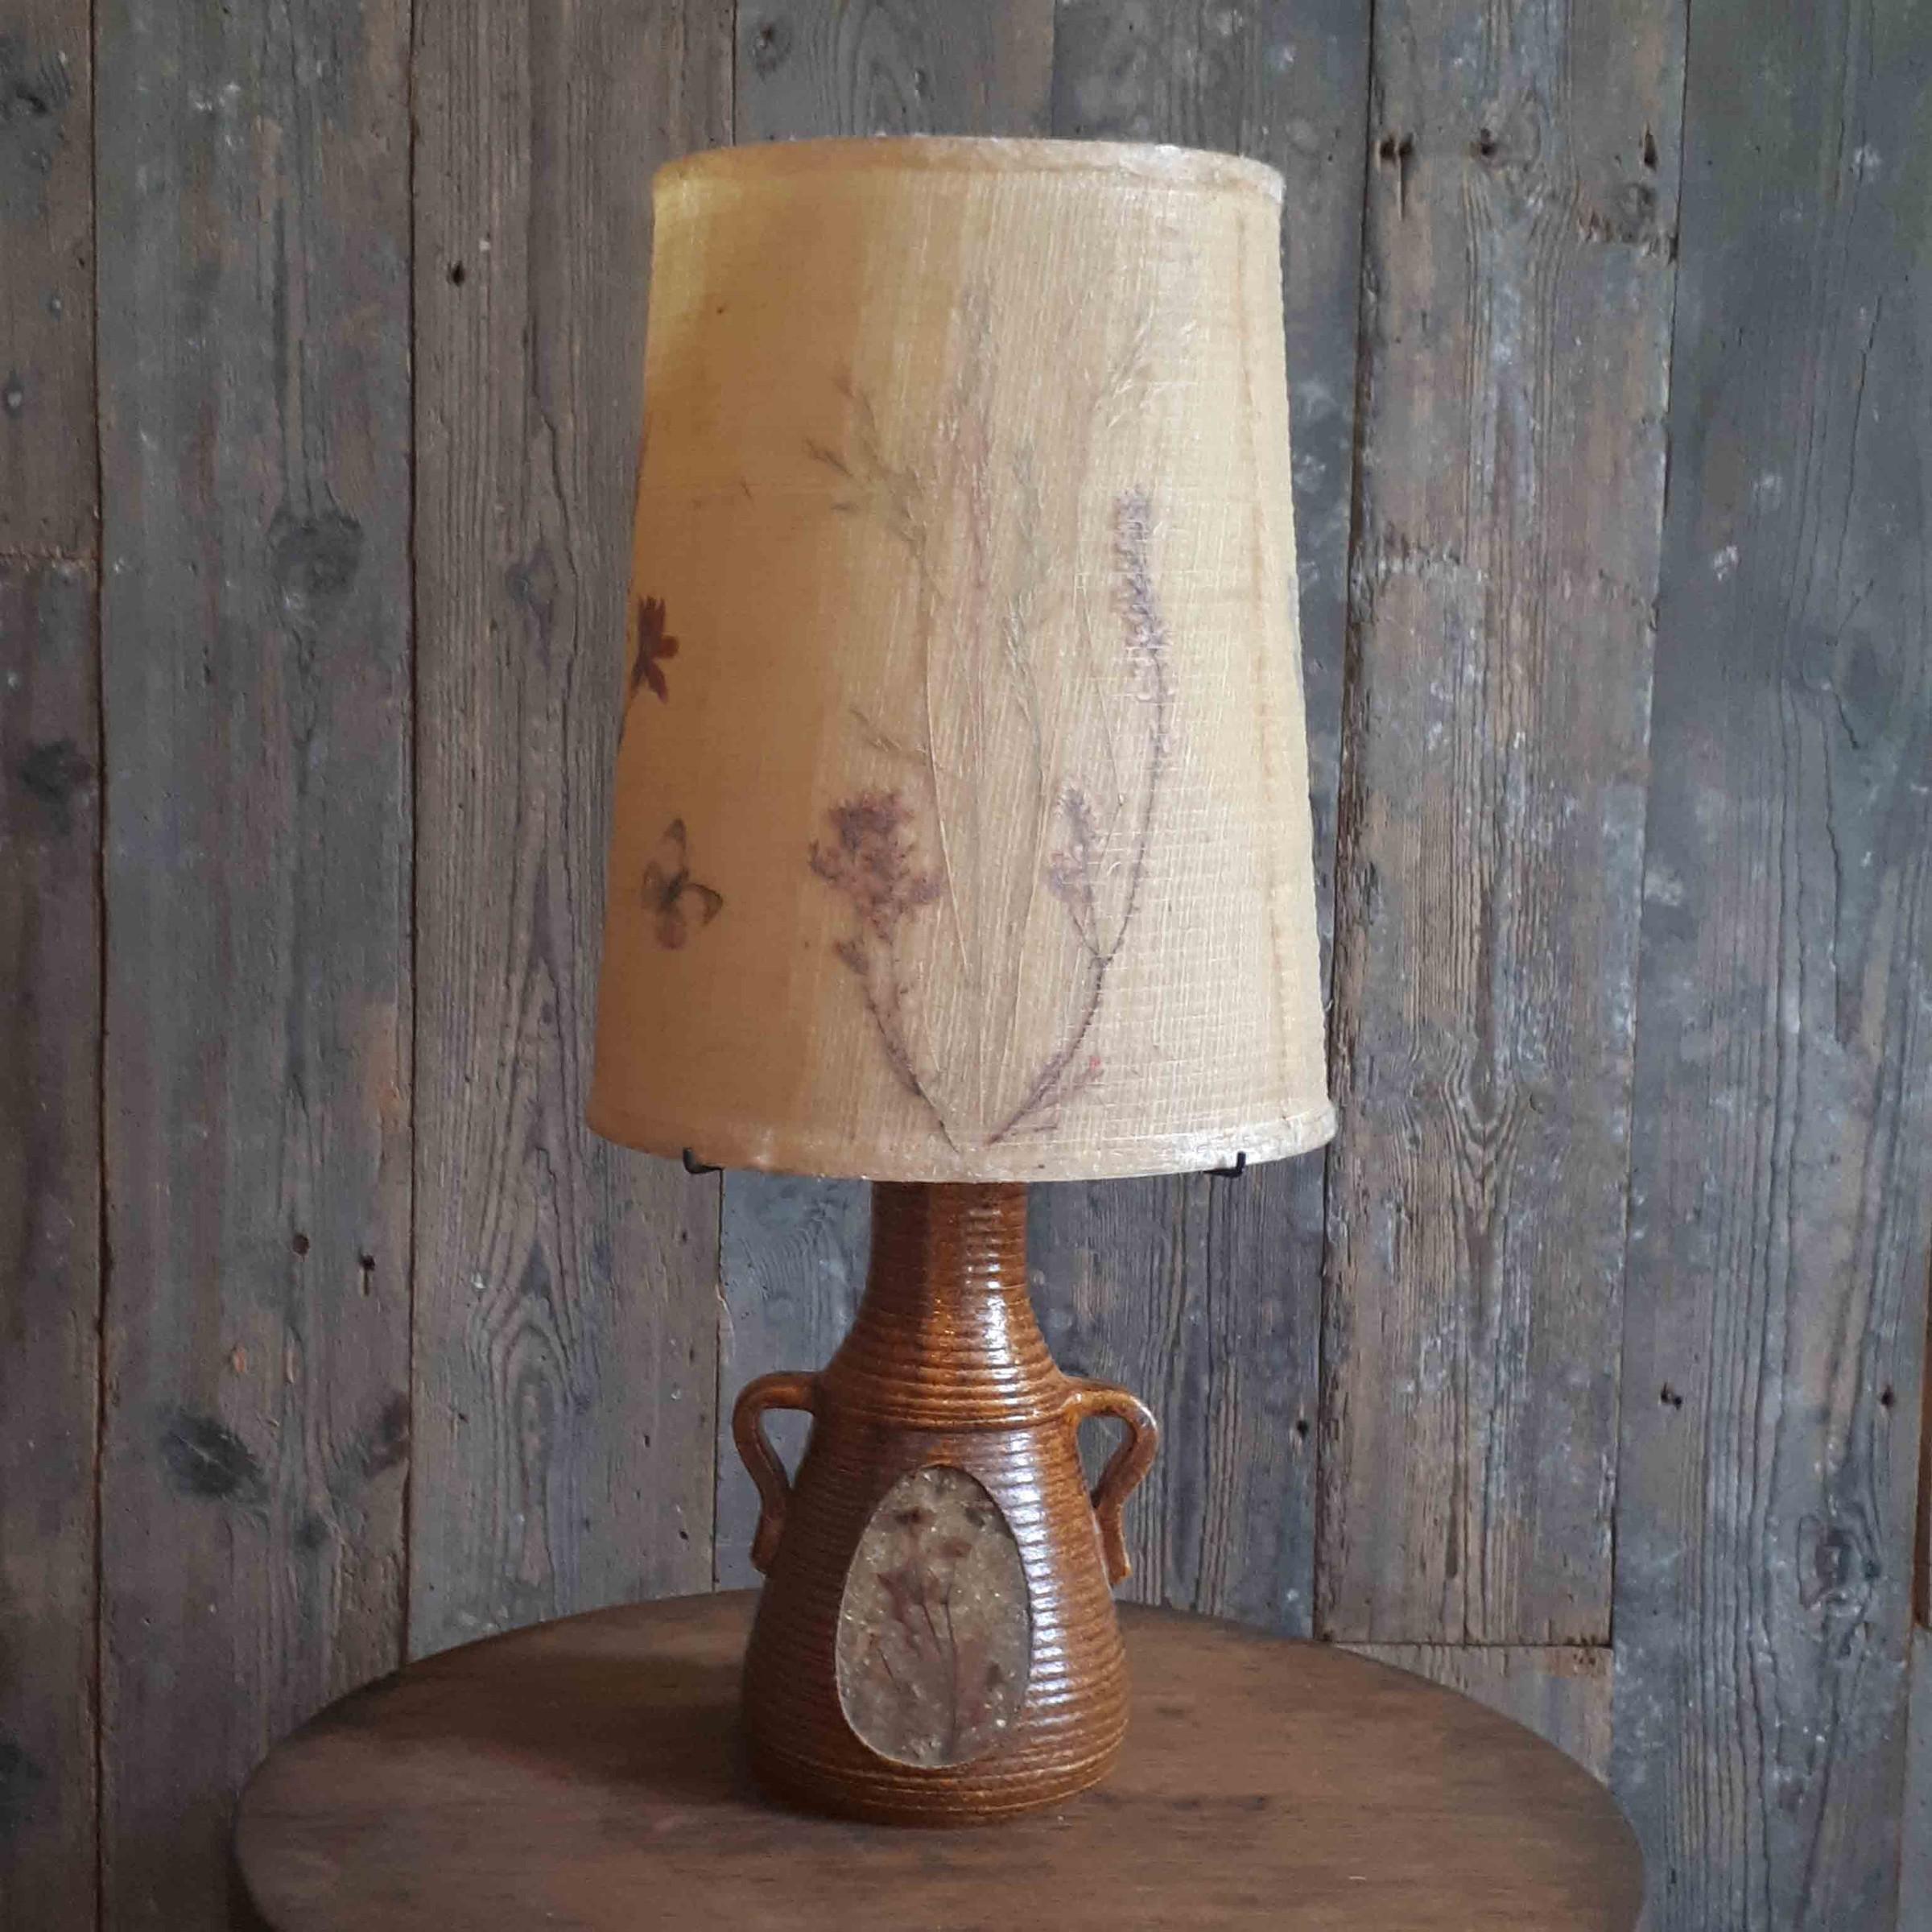 Accolay braune Keramiklampe mit originalem Lampenschirm